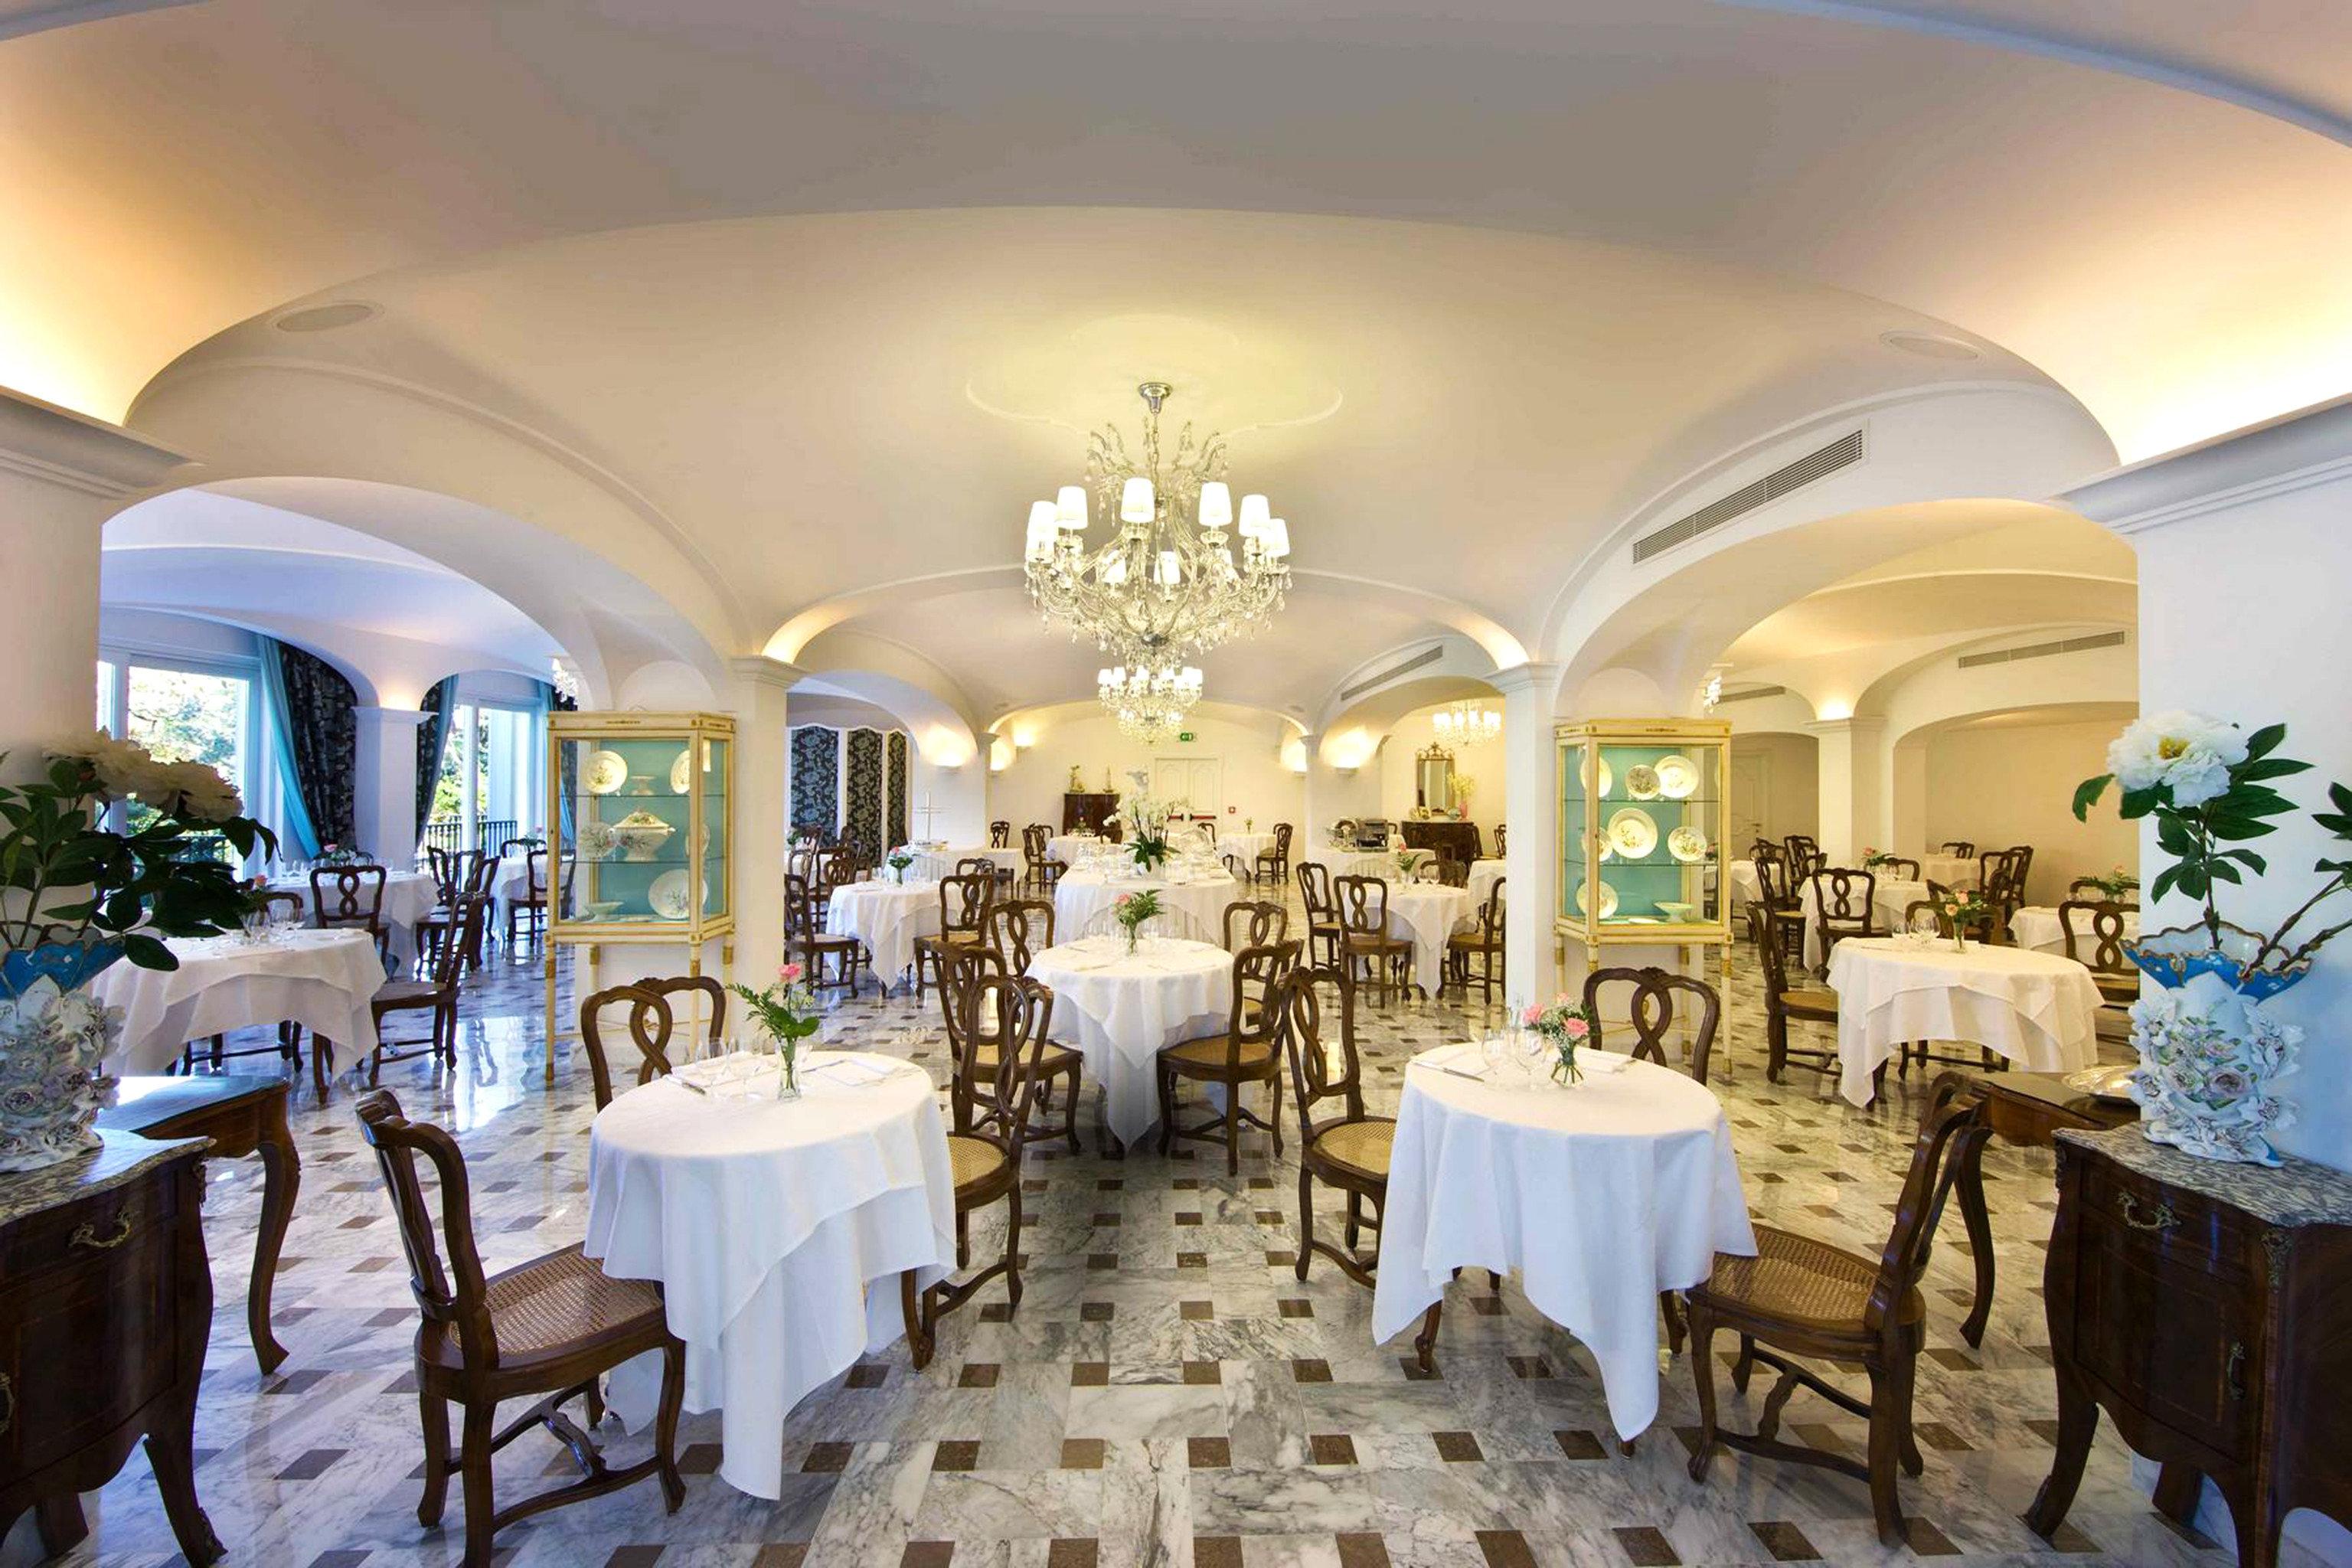 Classic Dining Eat Scenic views Sea function hall restaurant Resort ballroom convention center fancy